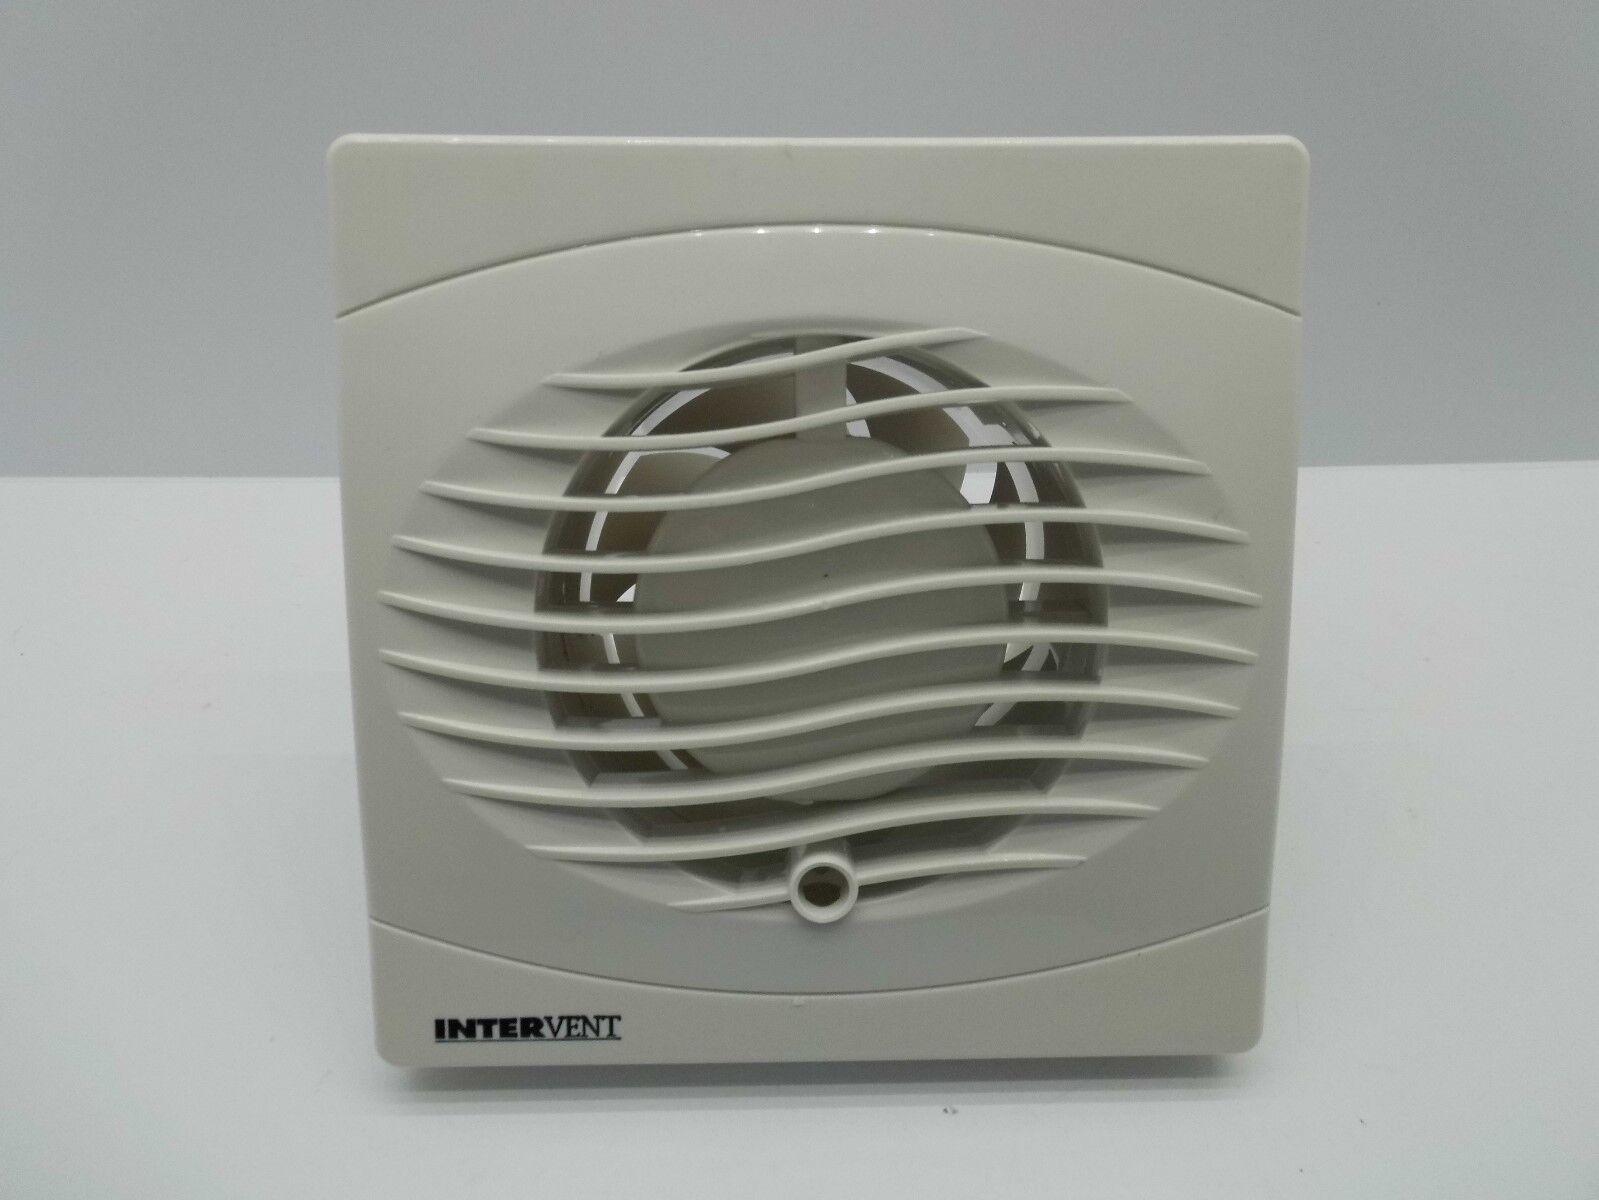 Manrose Intervent bvf100t Ventilador Extractor con temporizador//–/4/Inch//100/mm